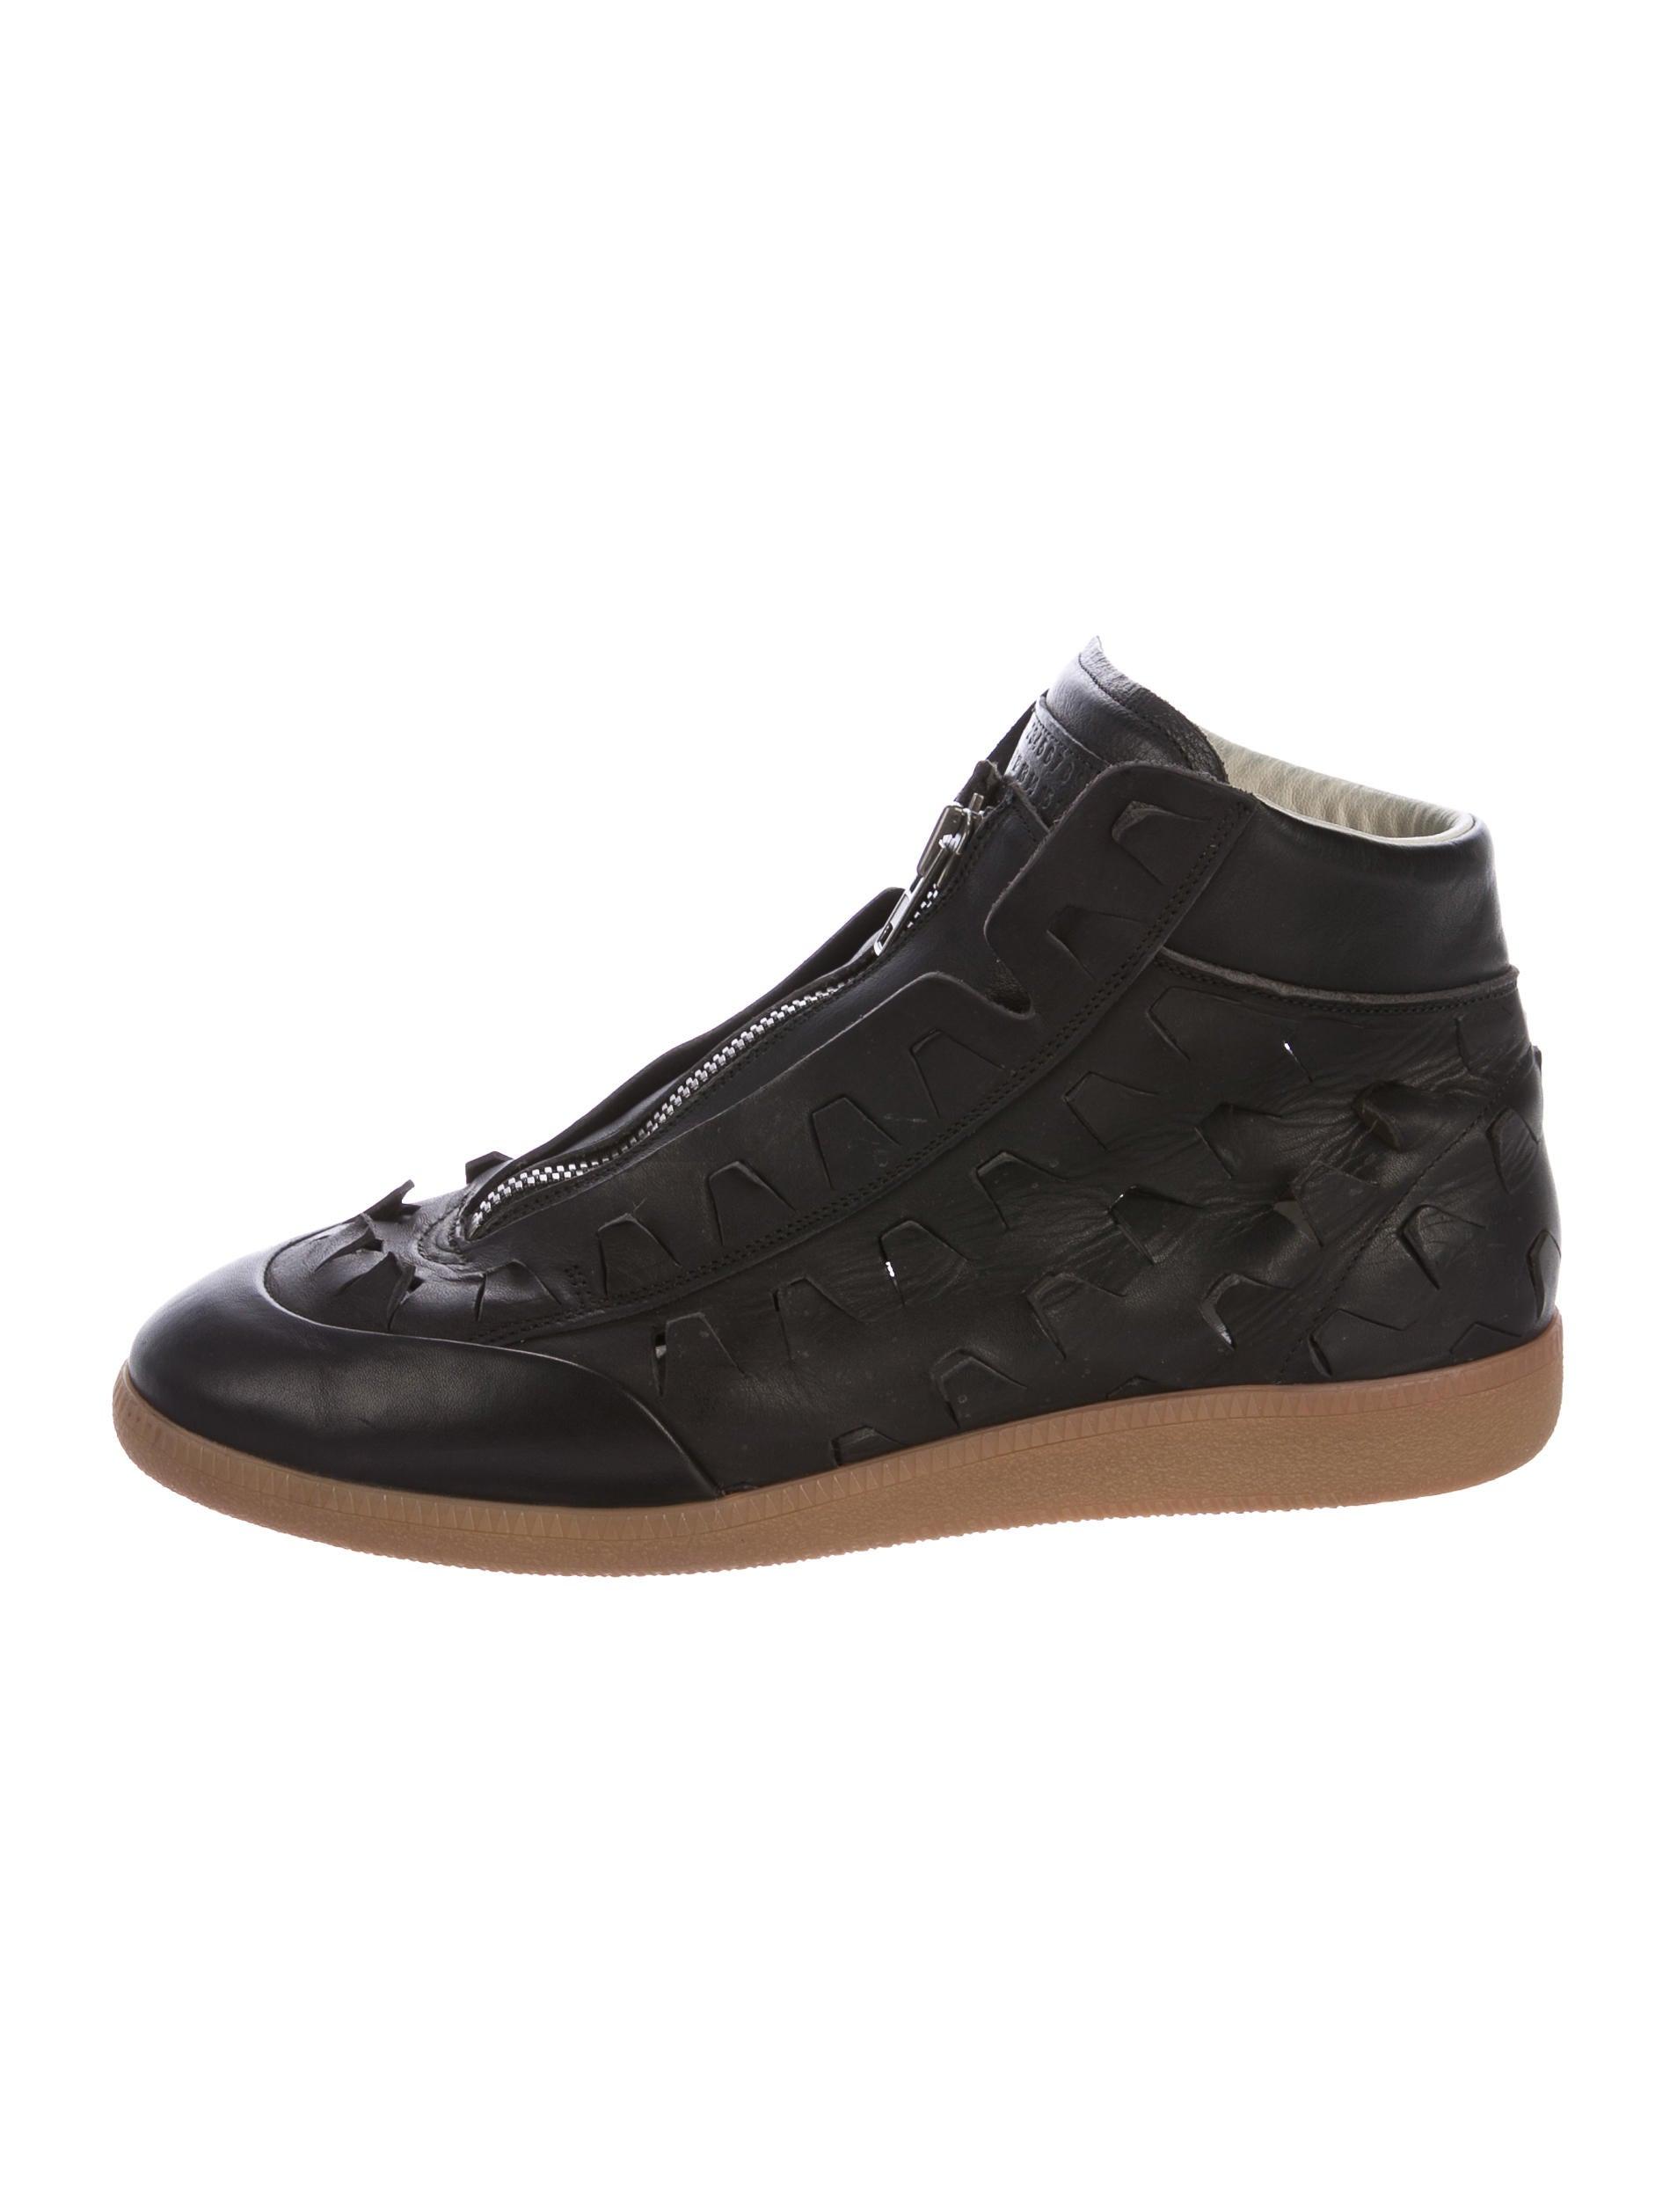 maison margiela leather cutout sneakers shoes mai31175 the realreal. Black Bedroom Furniture Sets. Home Design Ideas